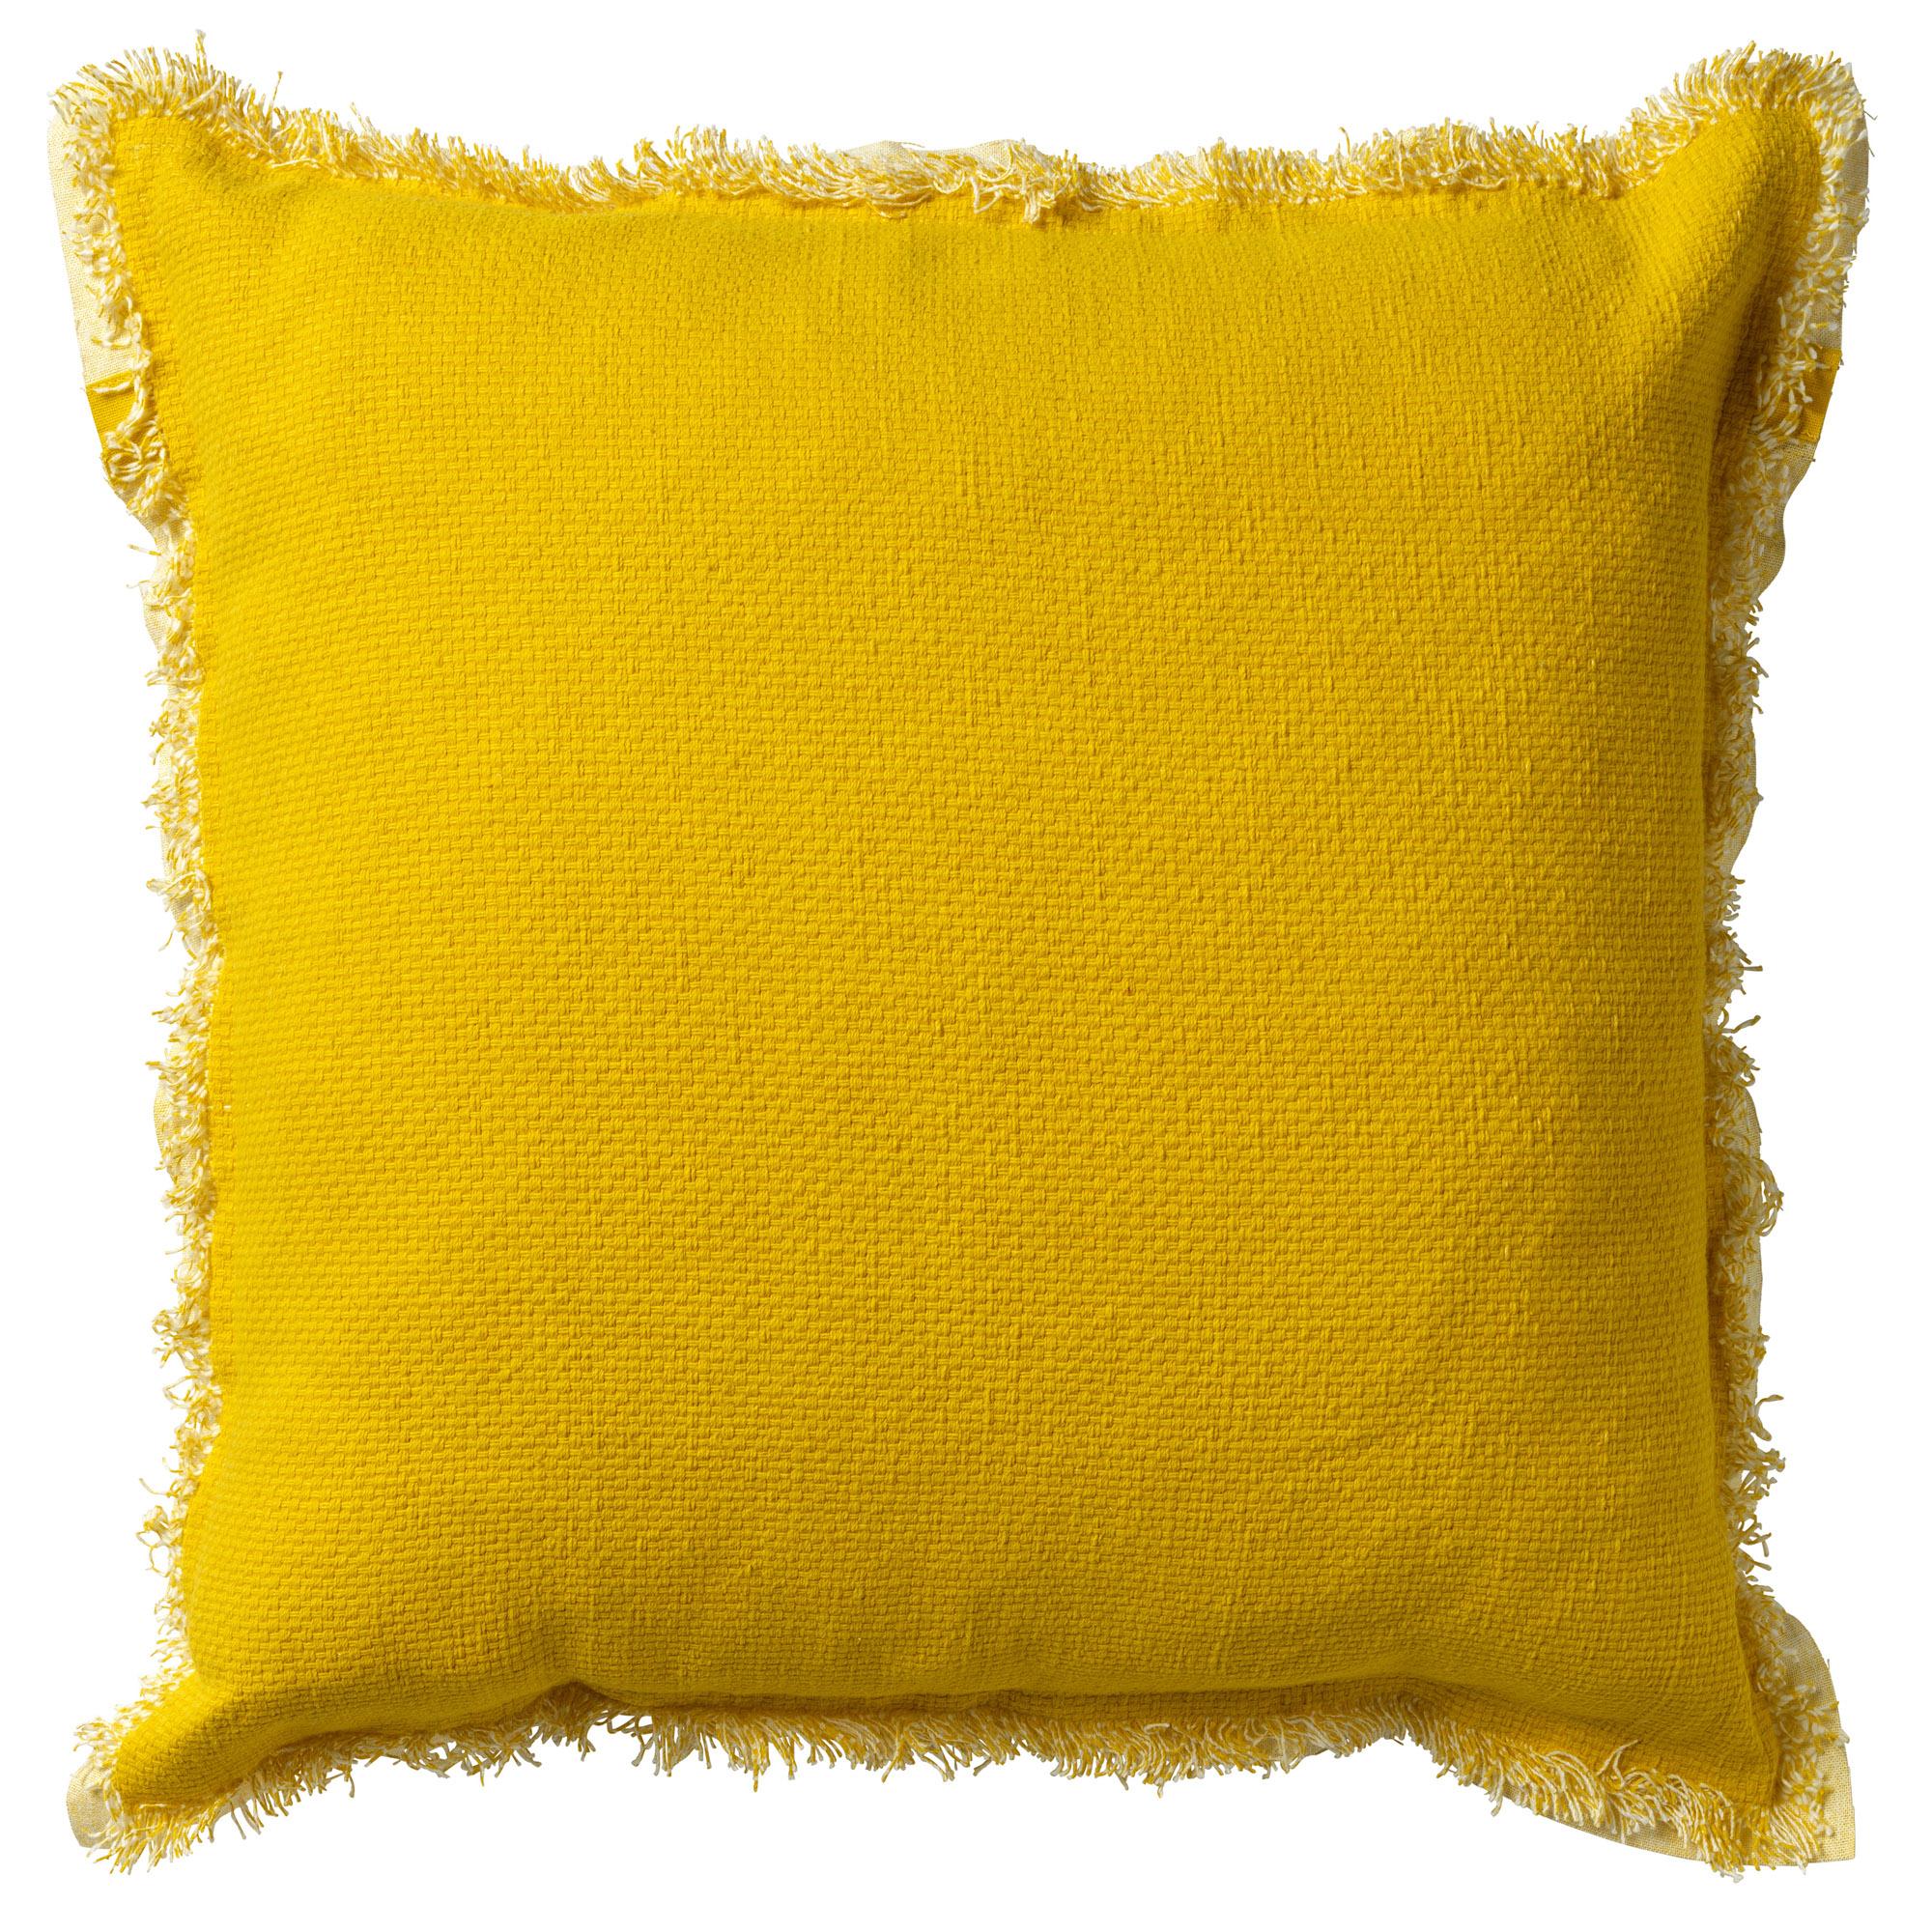 BURTO - Sierkussen van katoen Lemon 60x60 cm